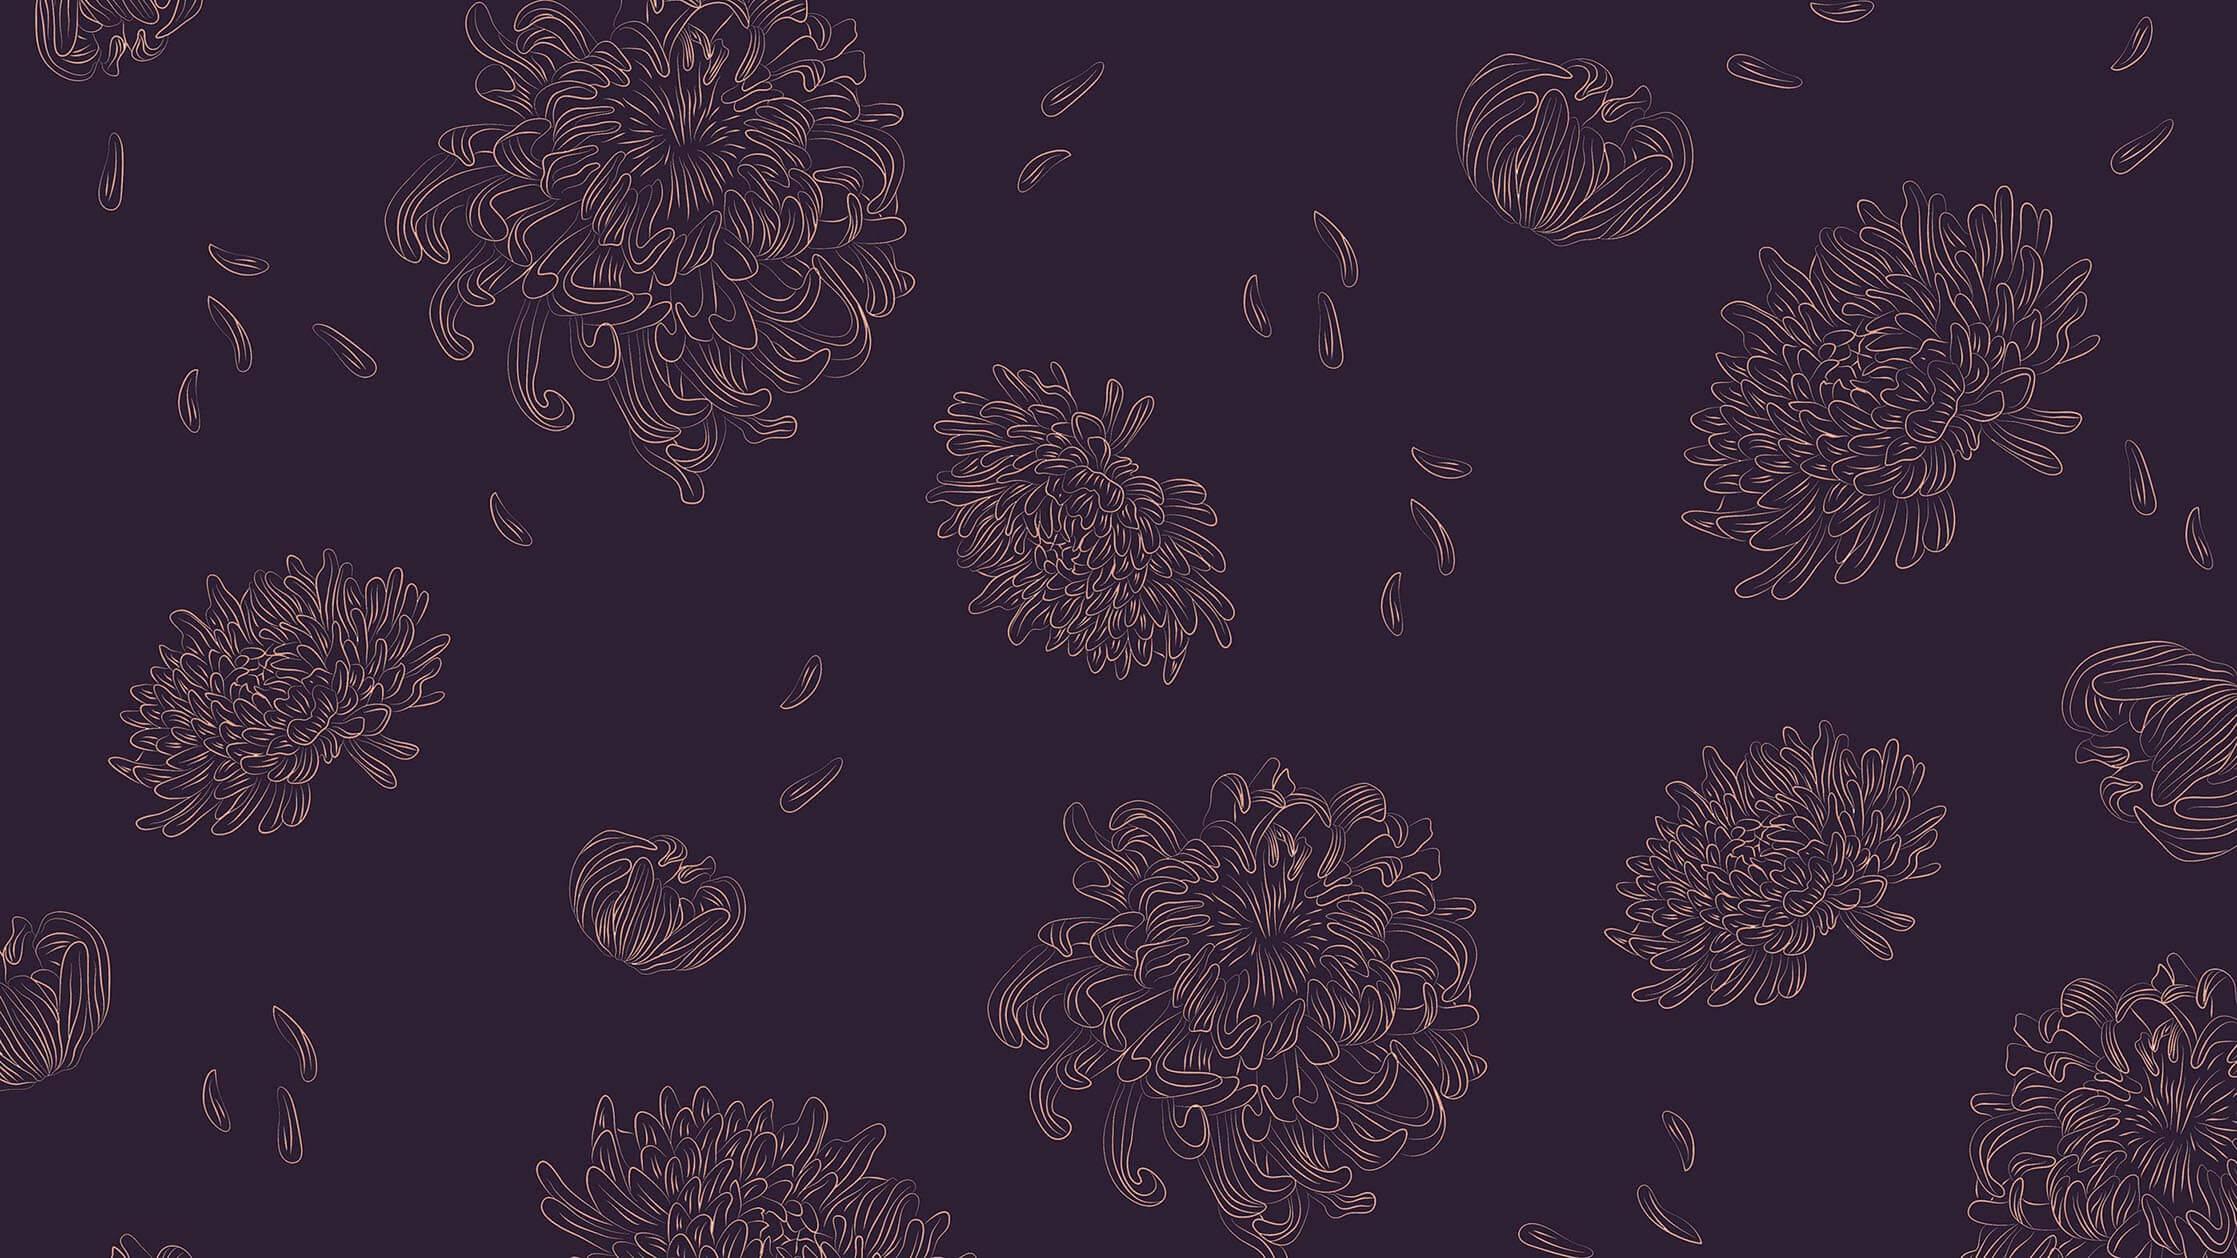 Chysanthemum_Illustration_Branding.jpg